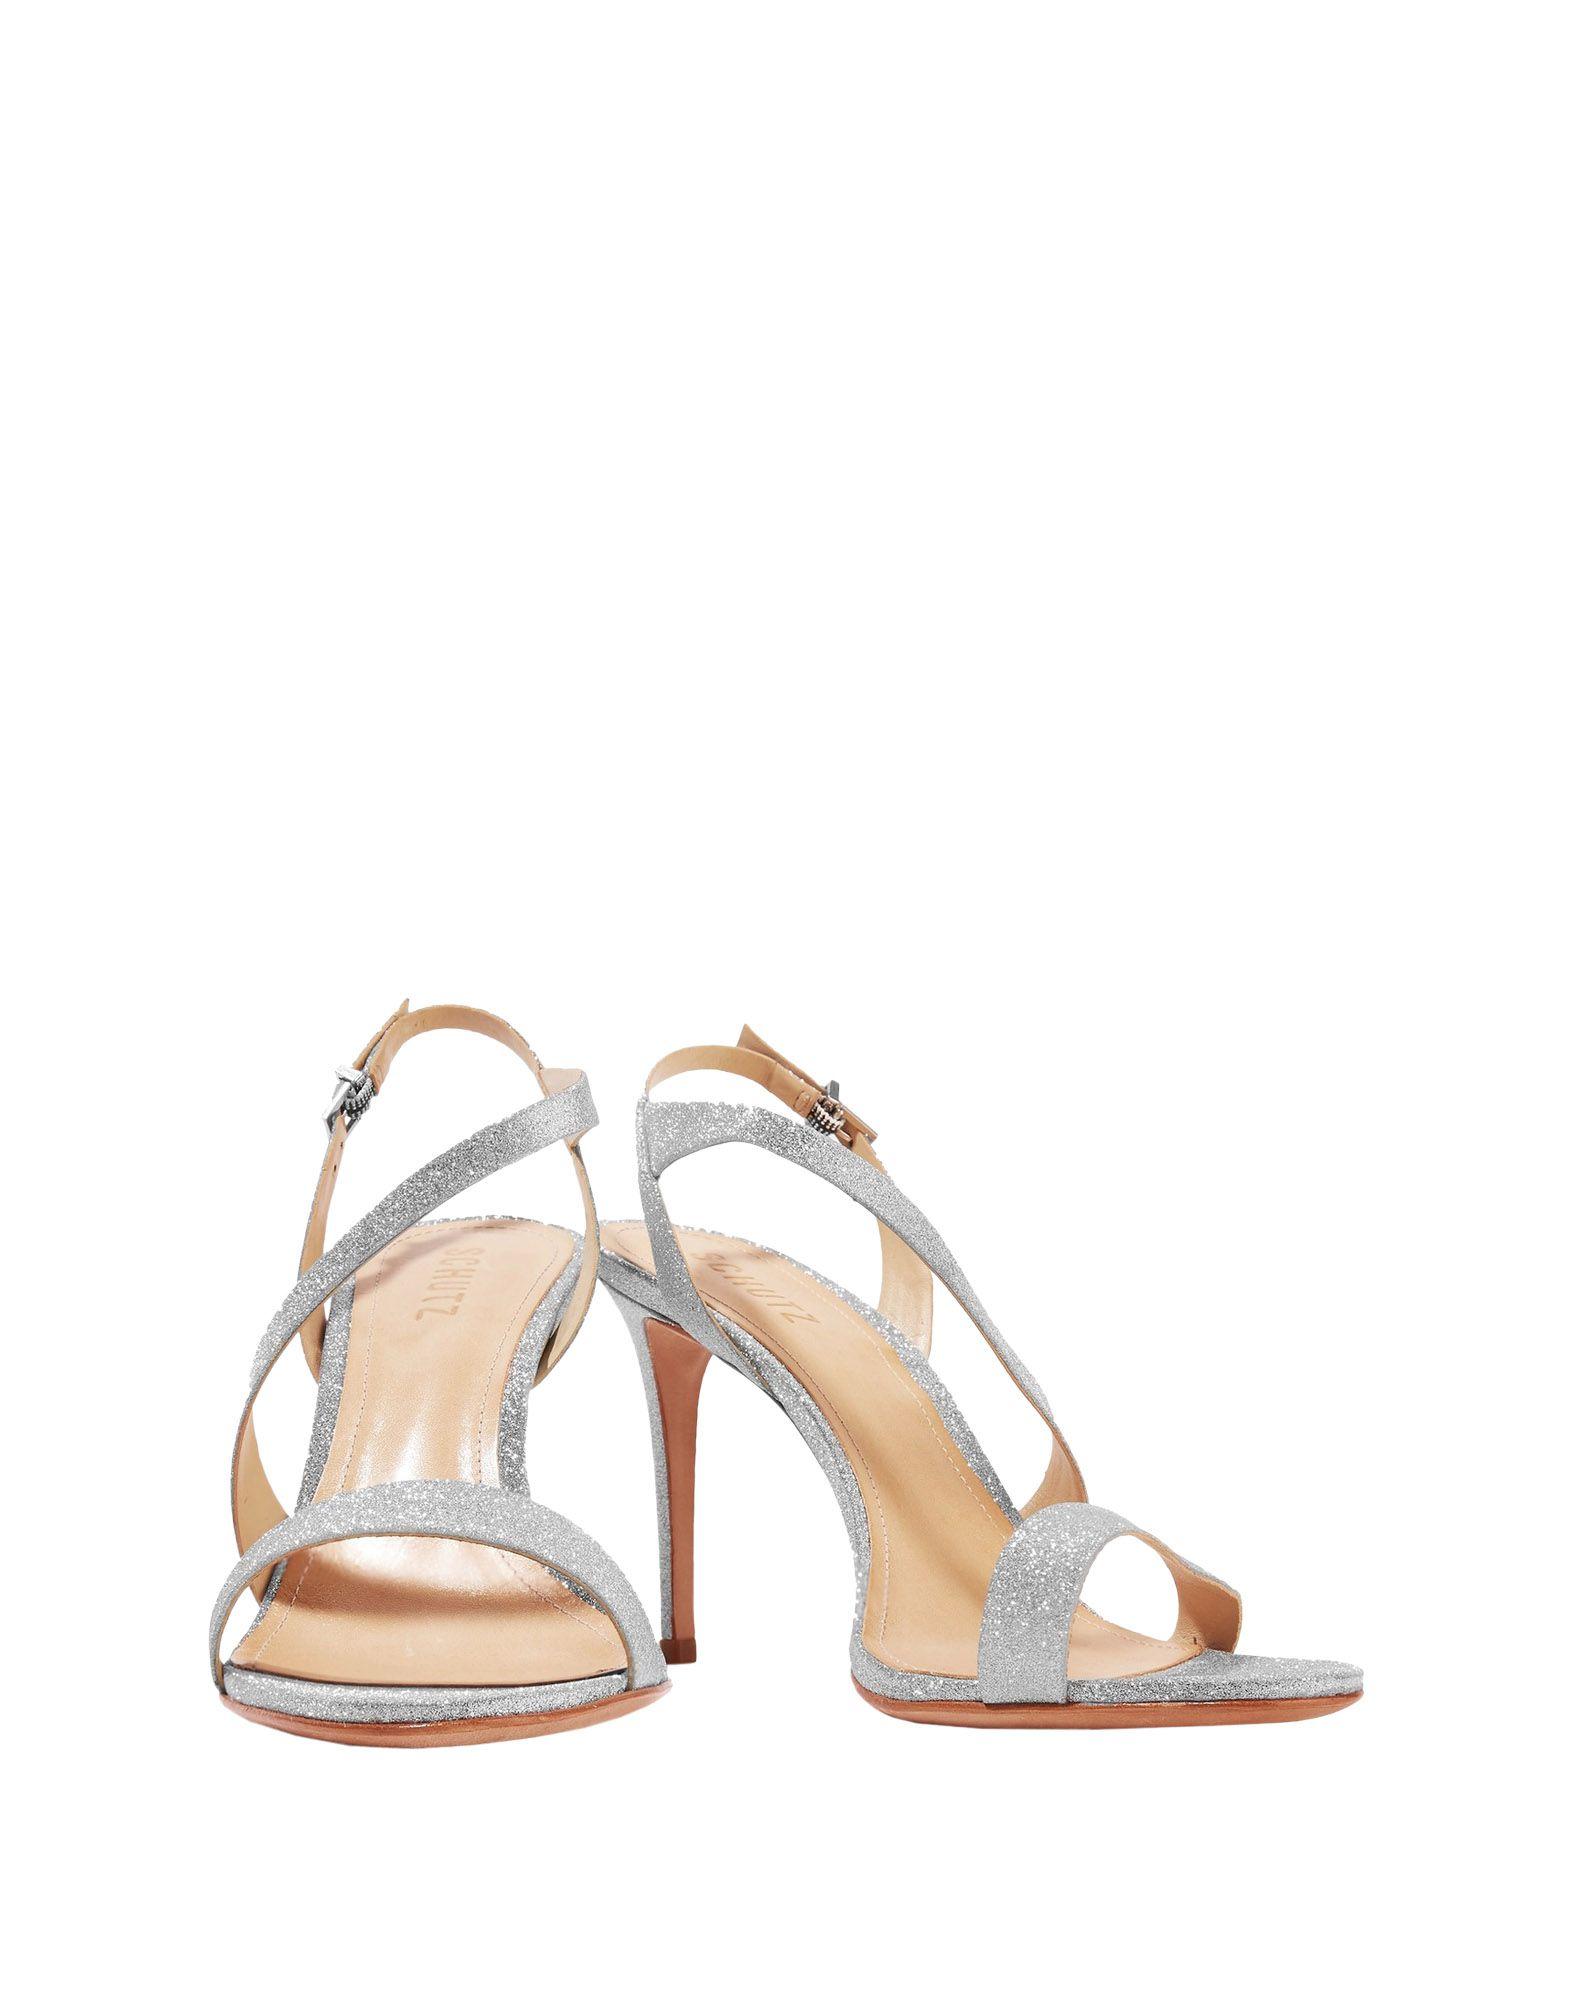 Schutz Sandals Sandals - Women Schutz Sandals Schutz online on  United Kingdom - 11527349GC 549f4d